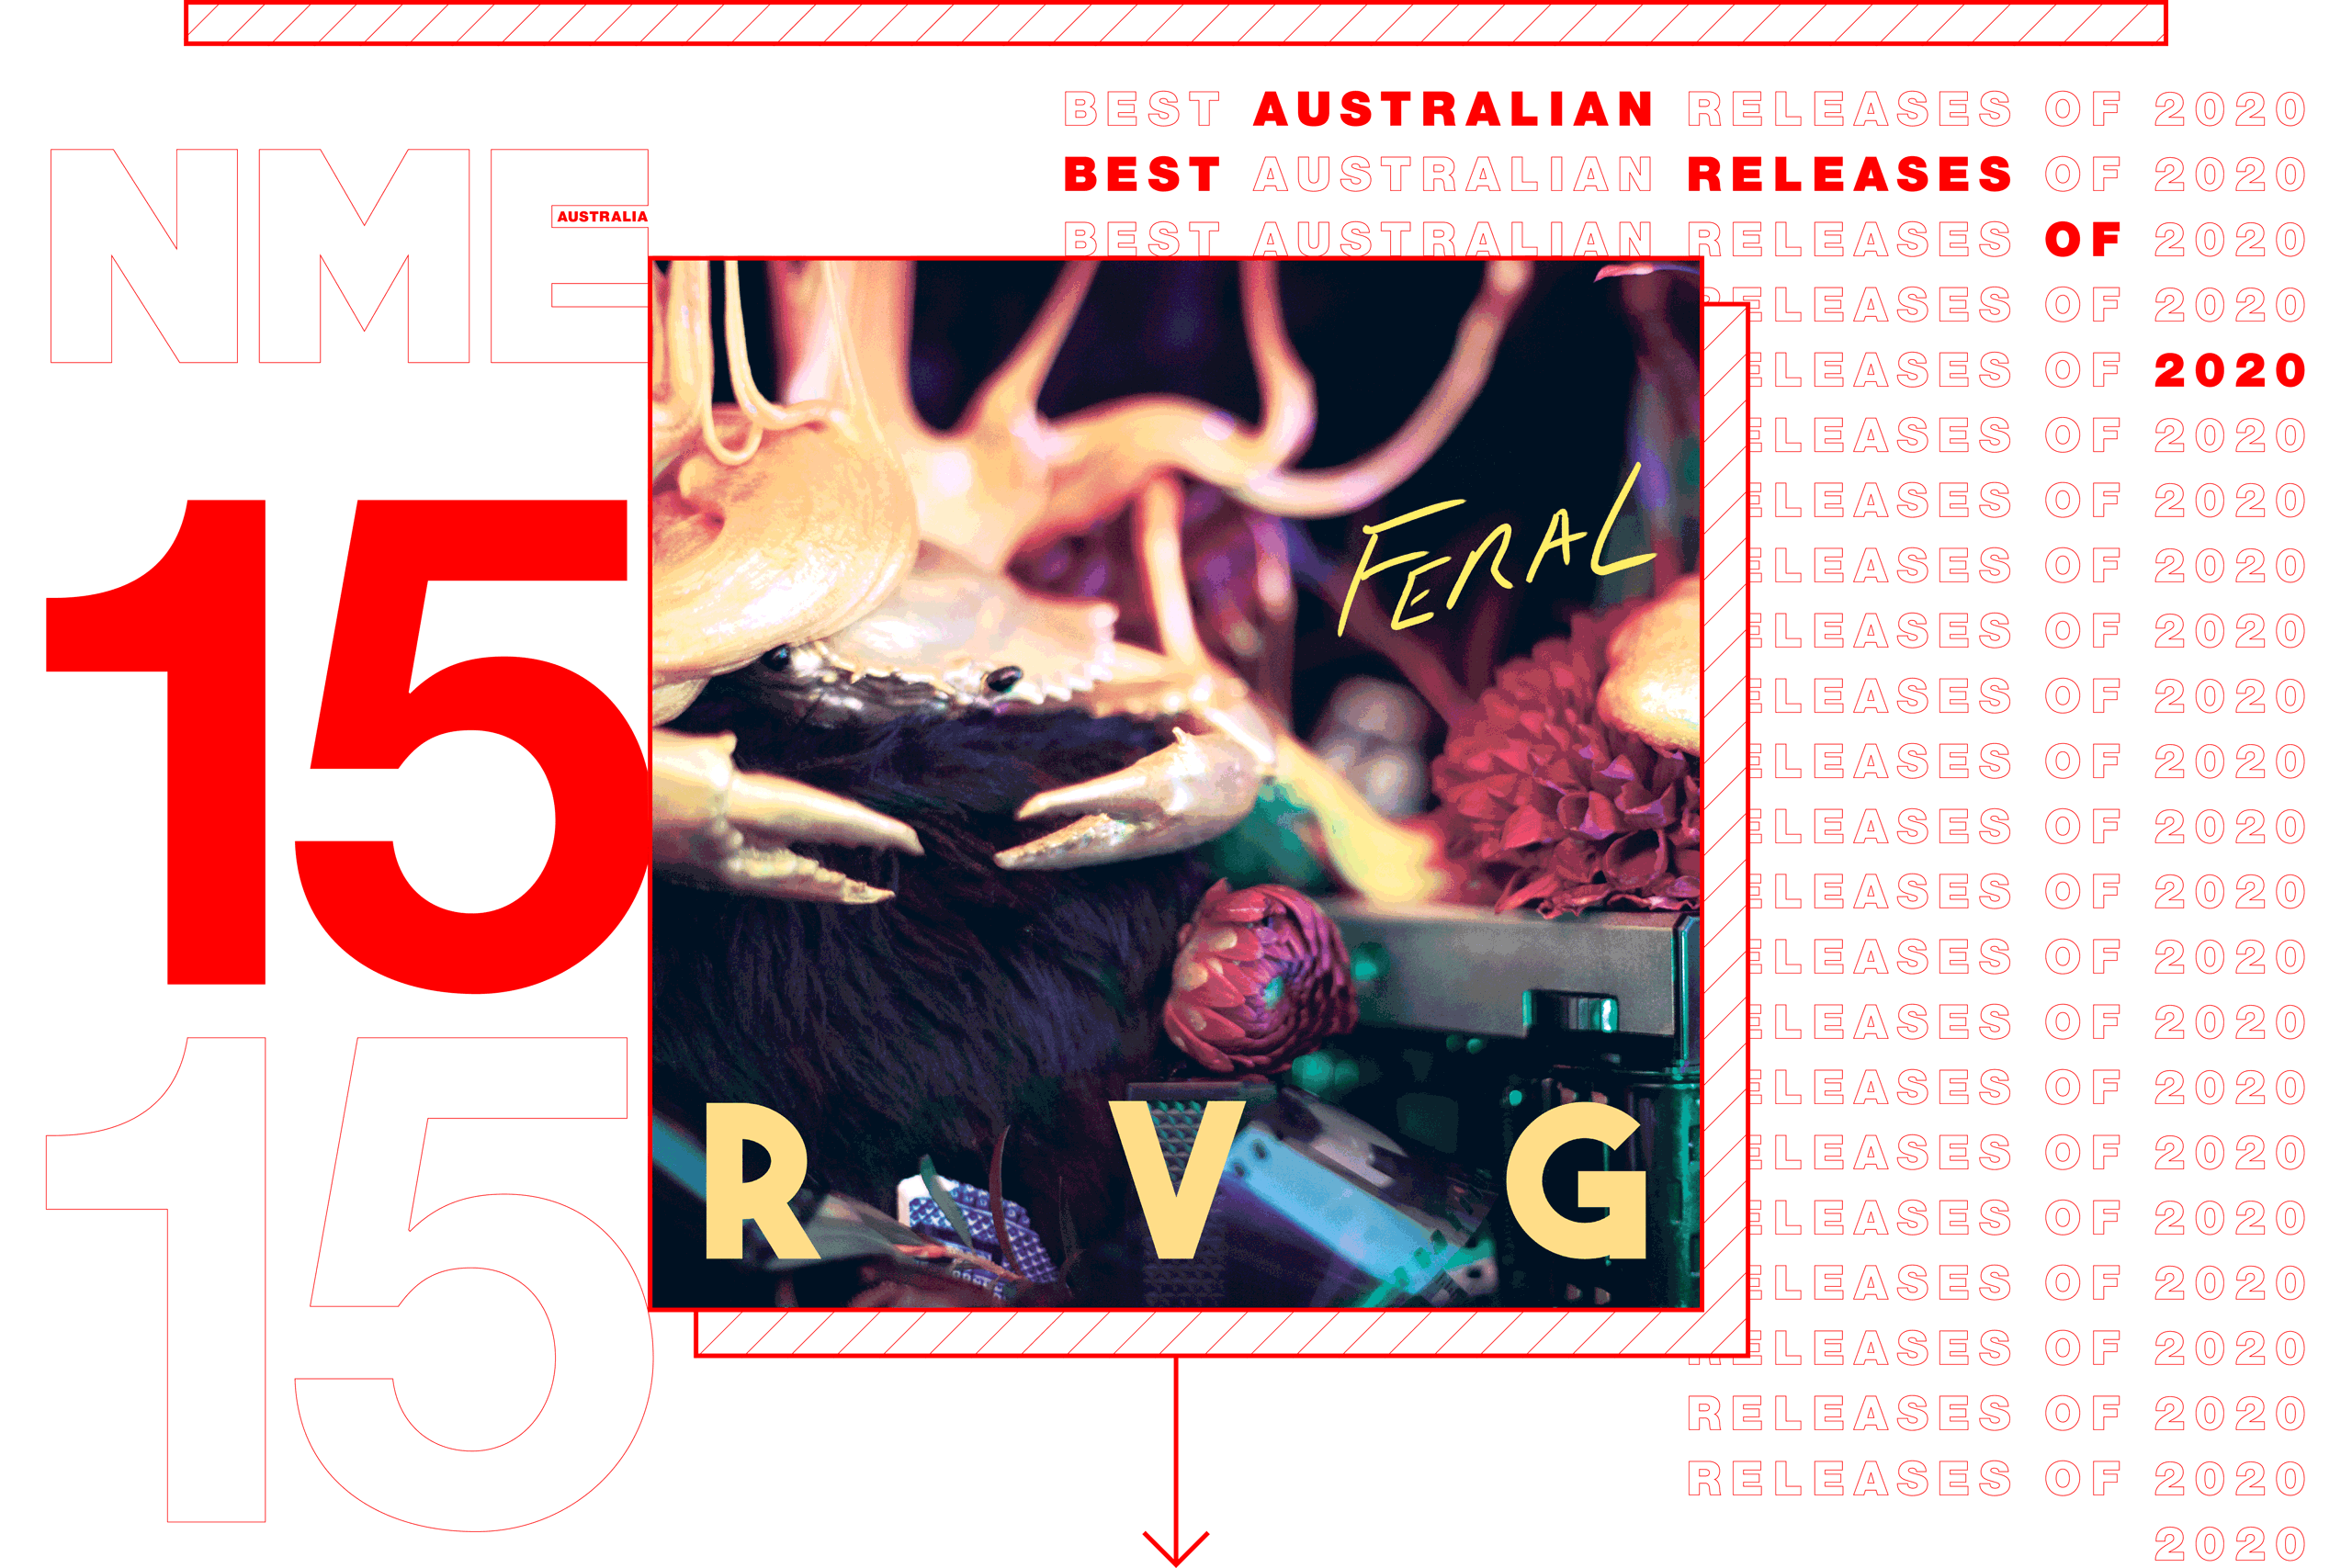 NME Australian Album Release 15